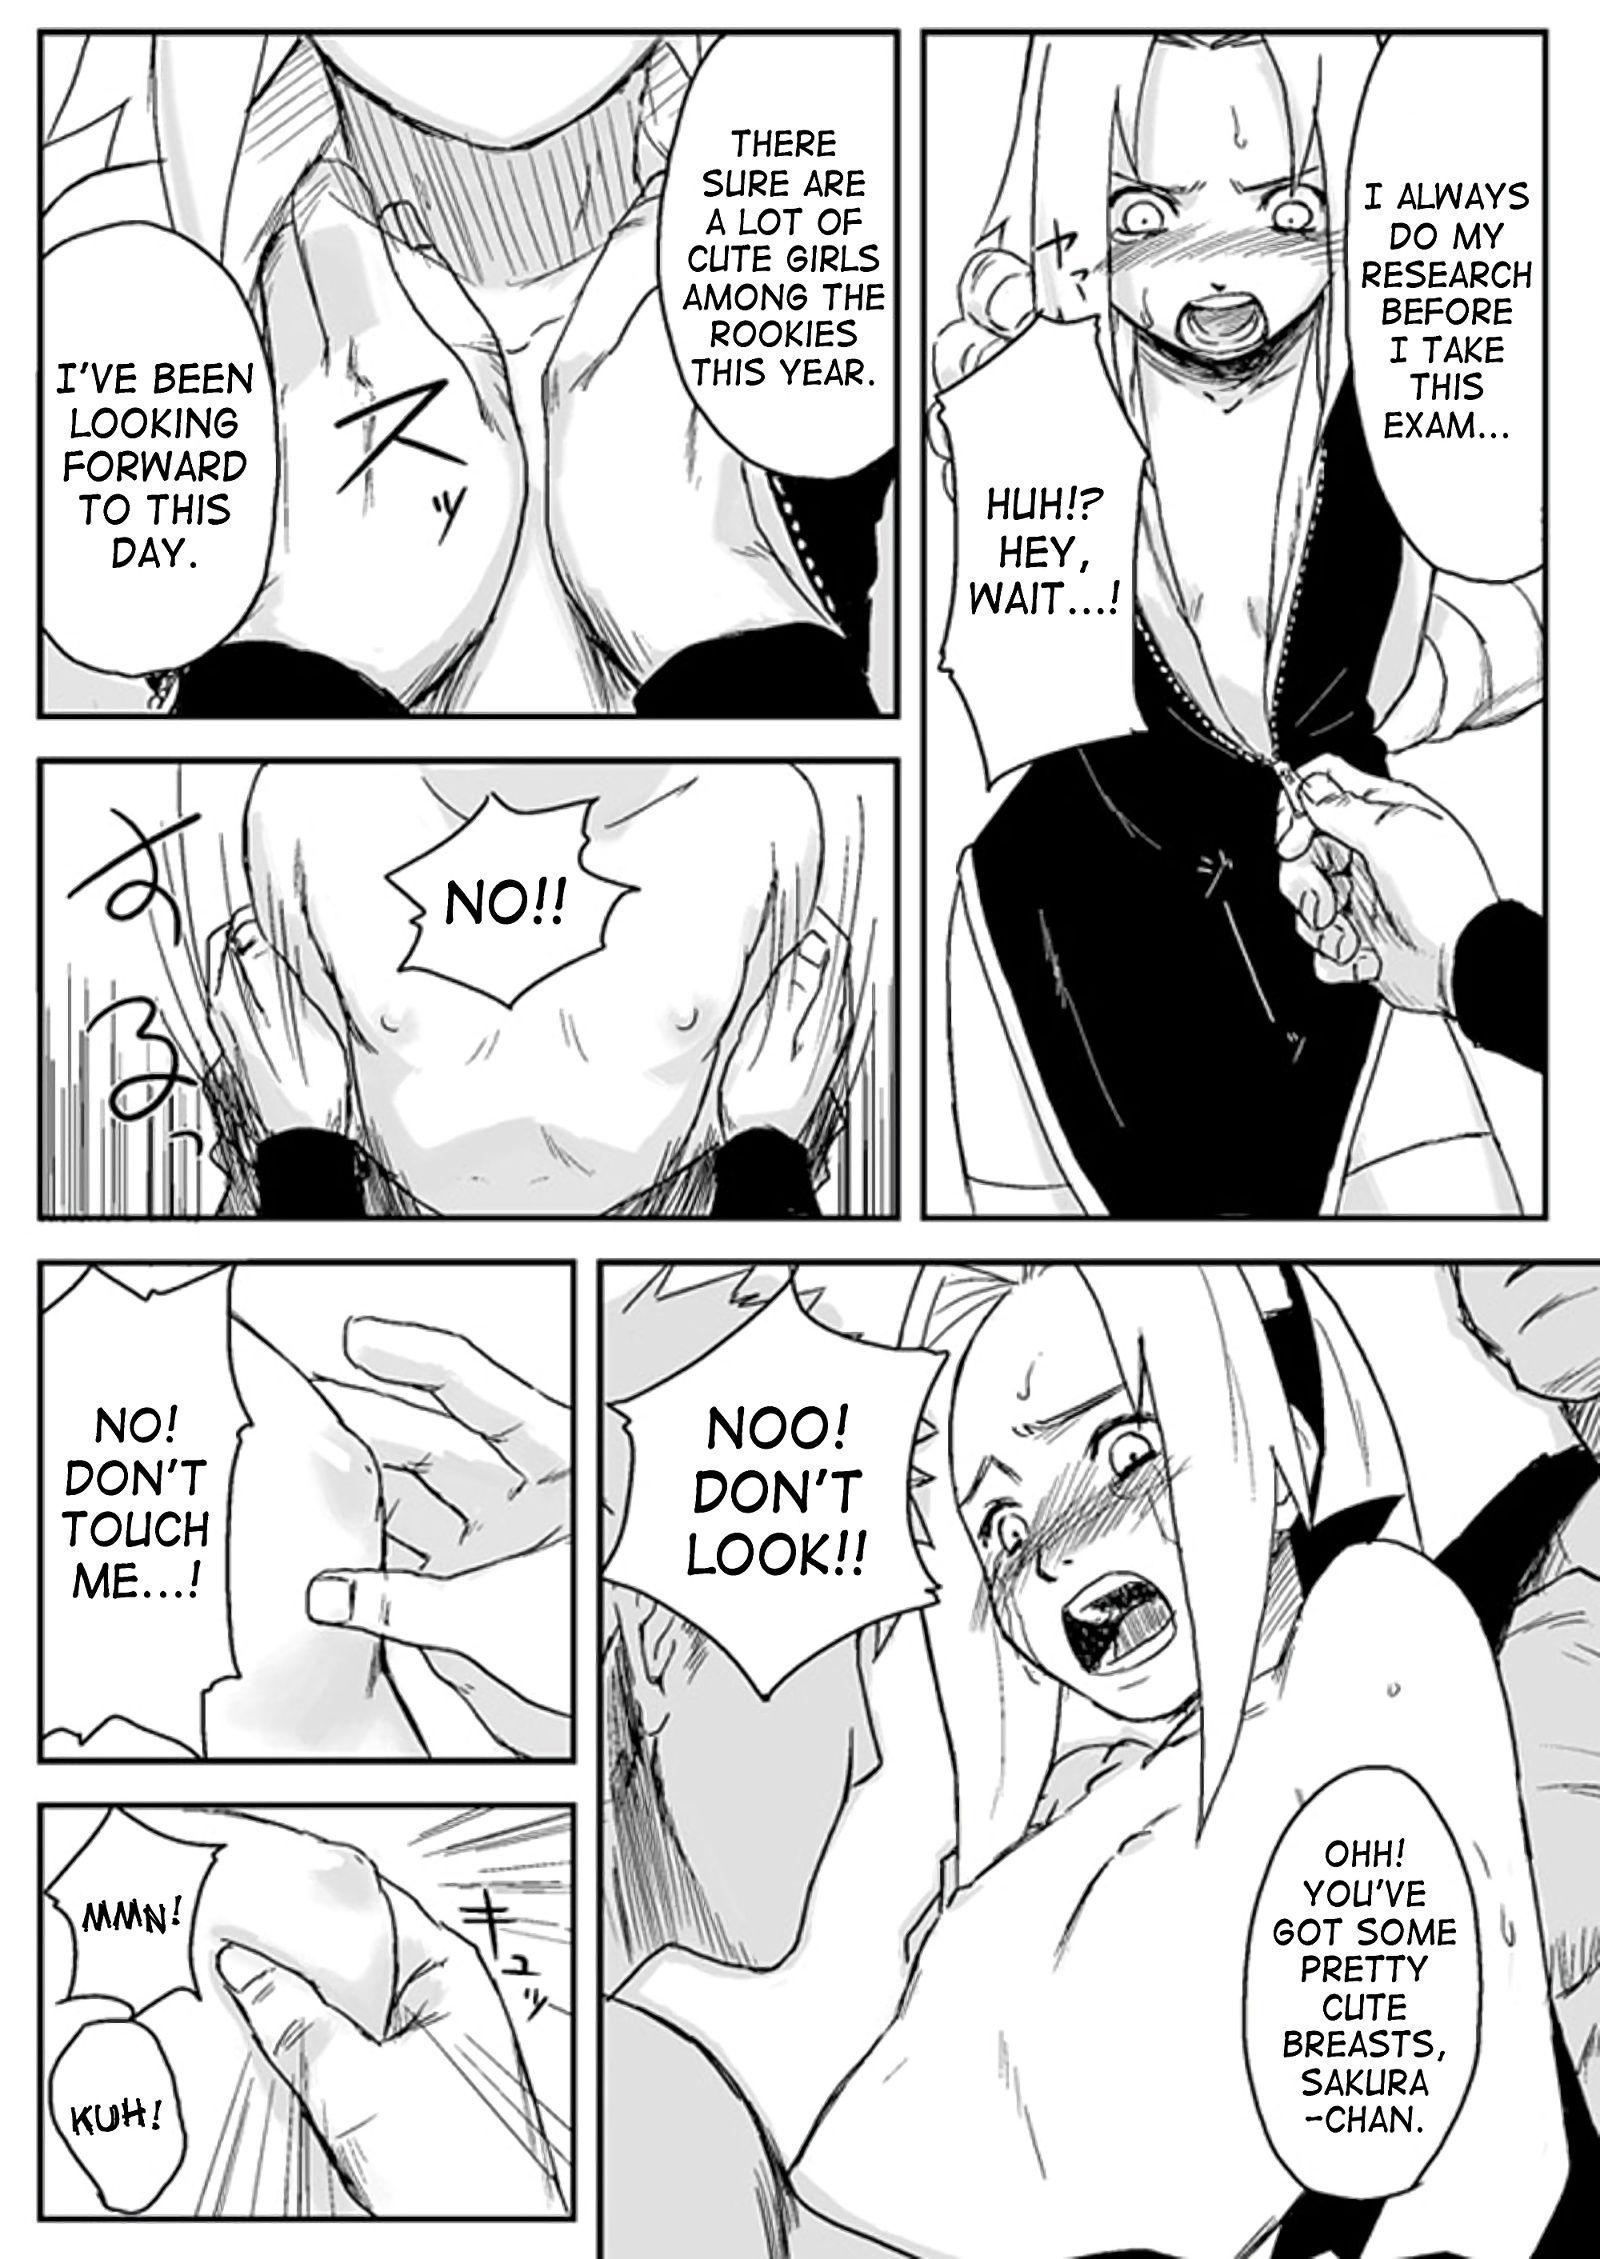 Ninja dependence vol. 1 hentai manga picture 3